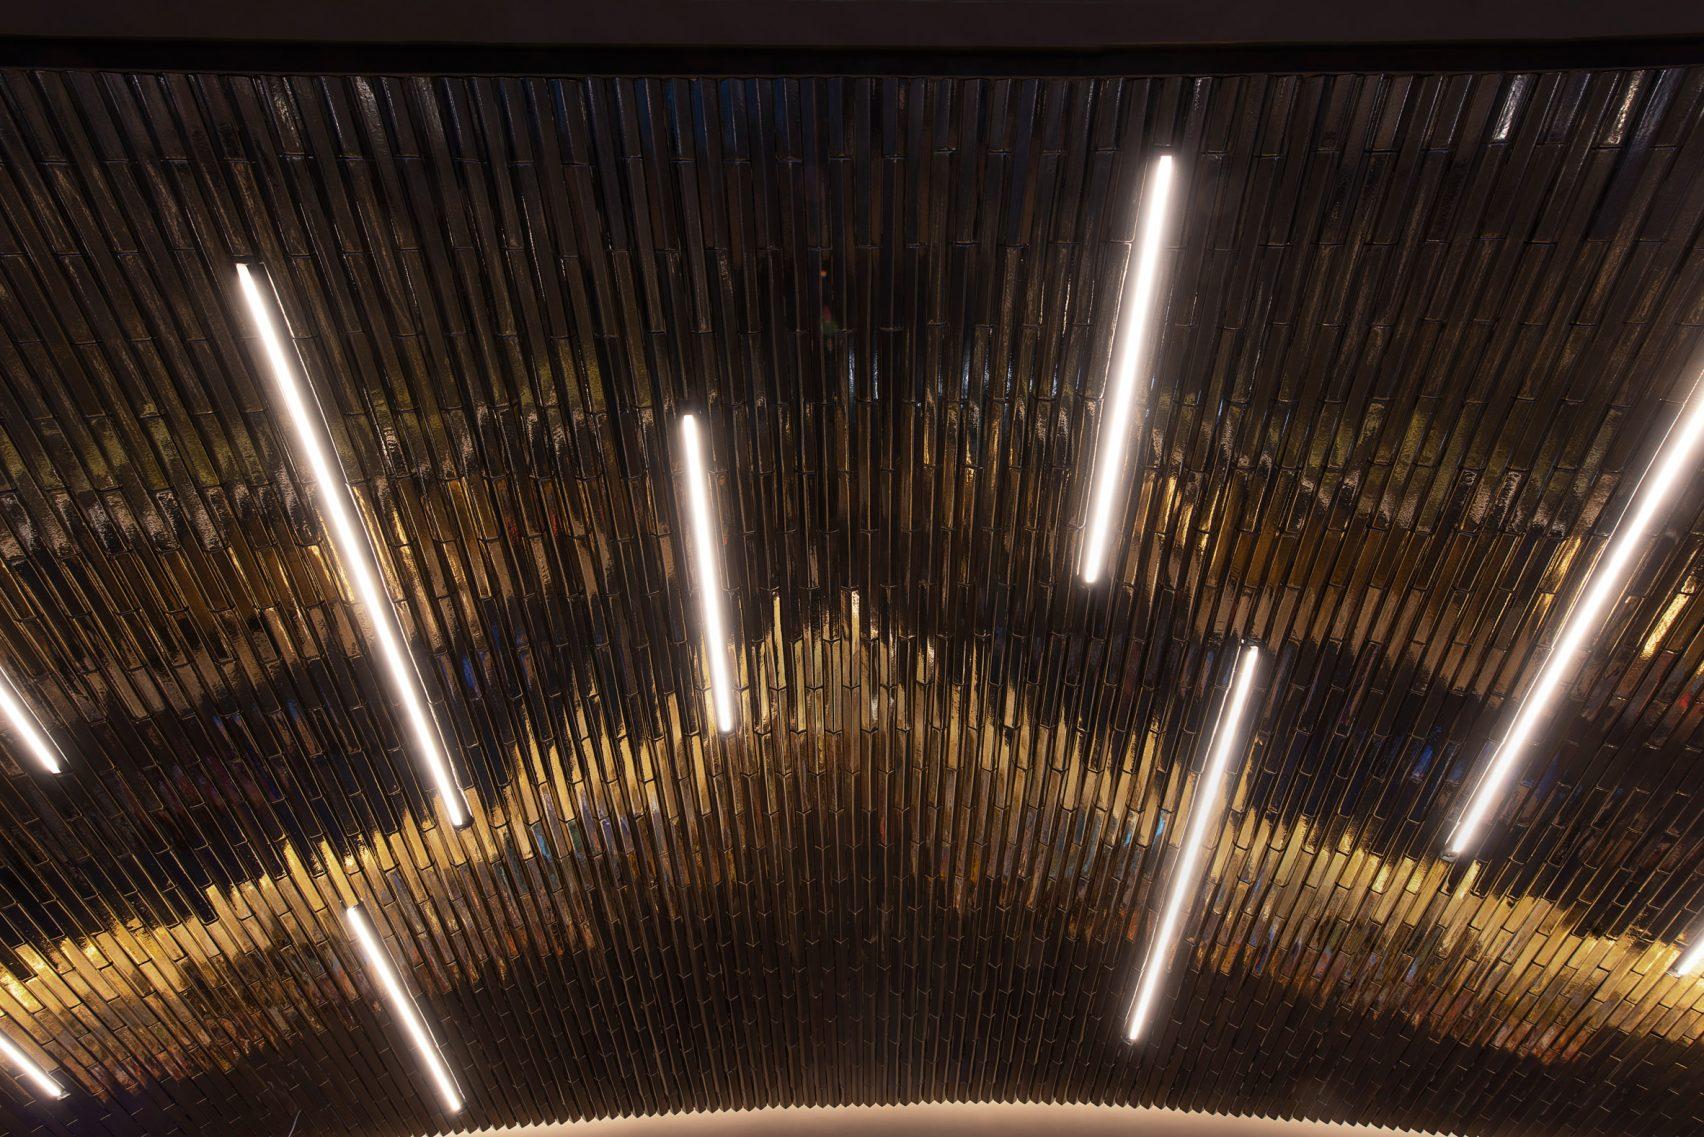 bar-auditorio-nacional-esrawe-interiors-mexico_dezeen_2364_col_6-1704x1137